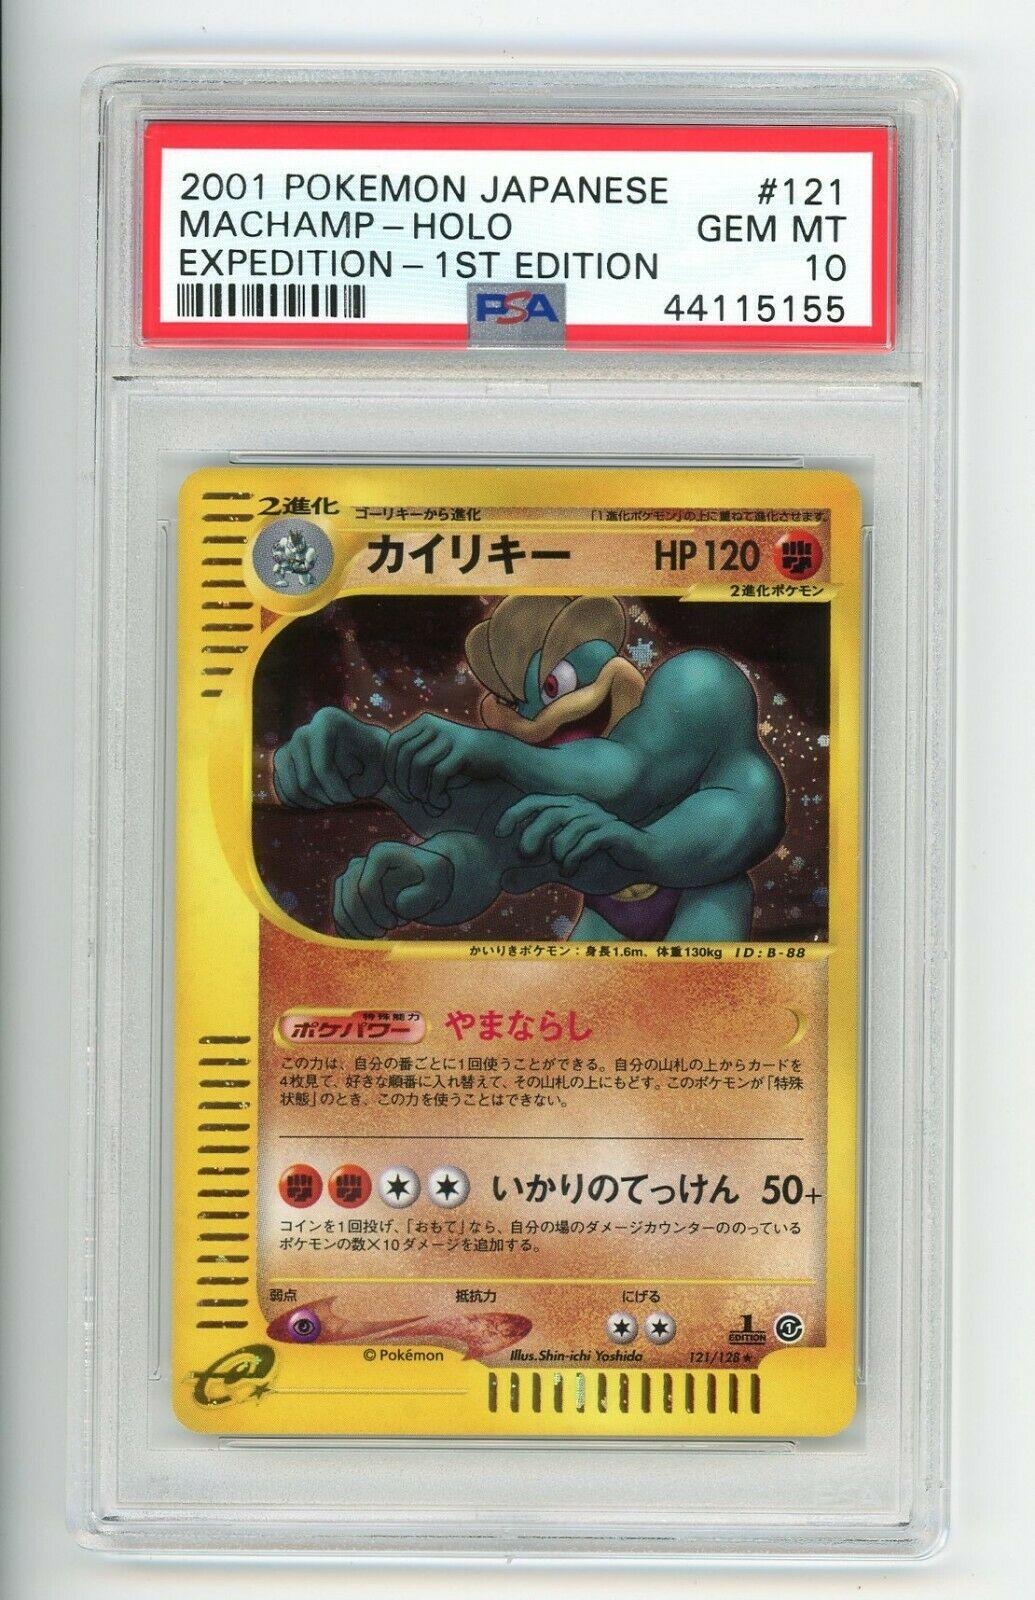 PSA 10 POKEMON JAPANESE MACHAMP 121128 CARD 2001 1ST ED ESERIES EXPEDITION